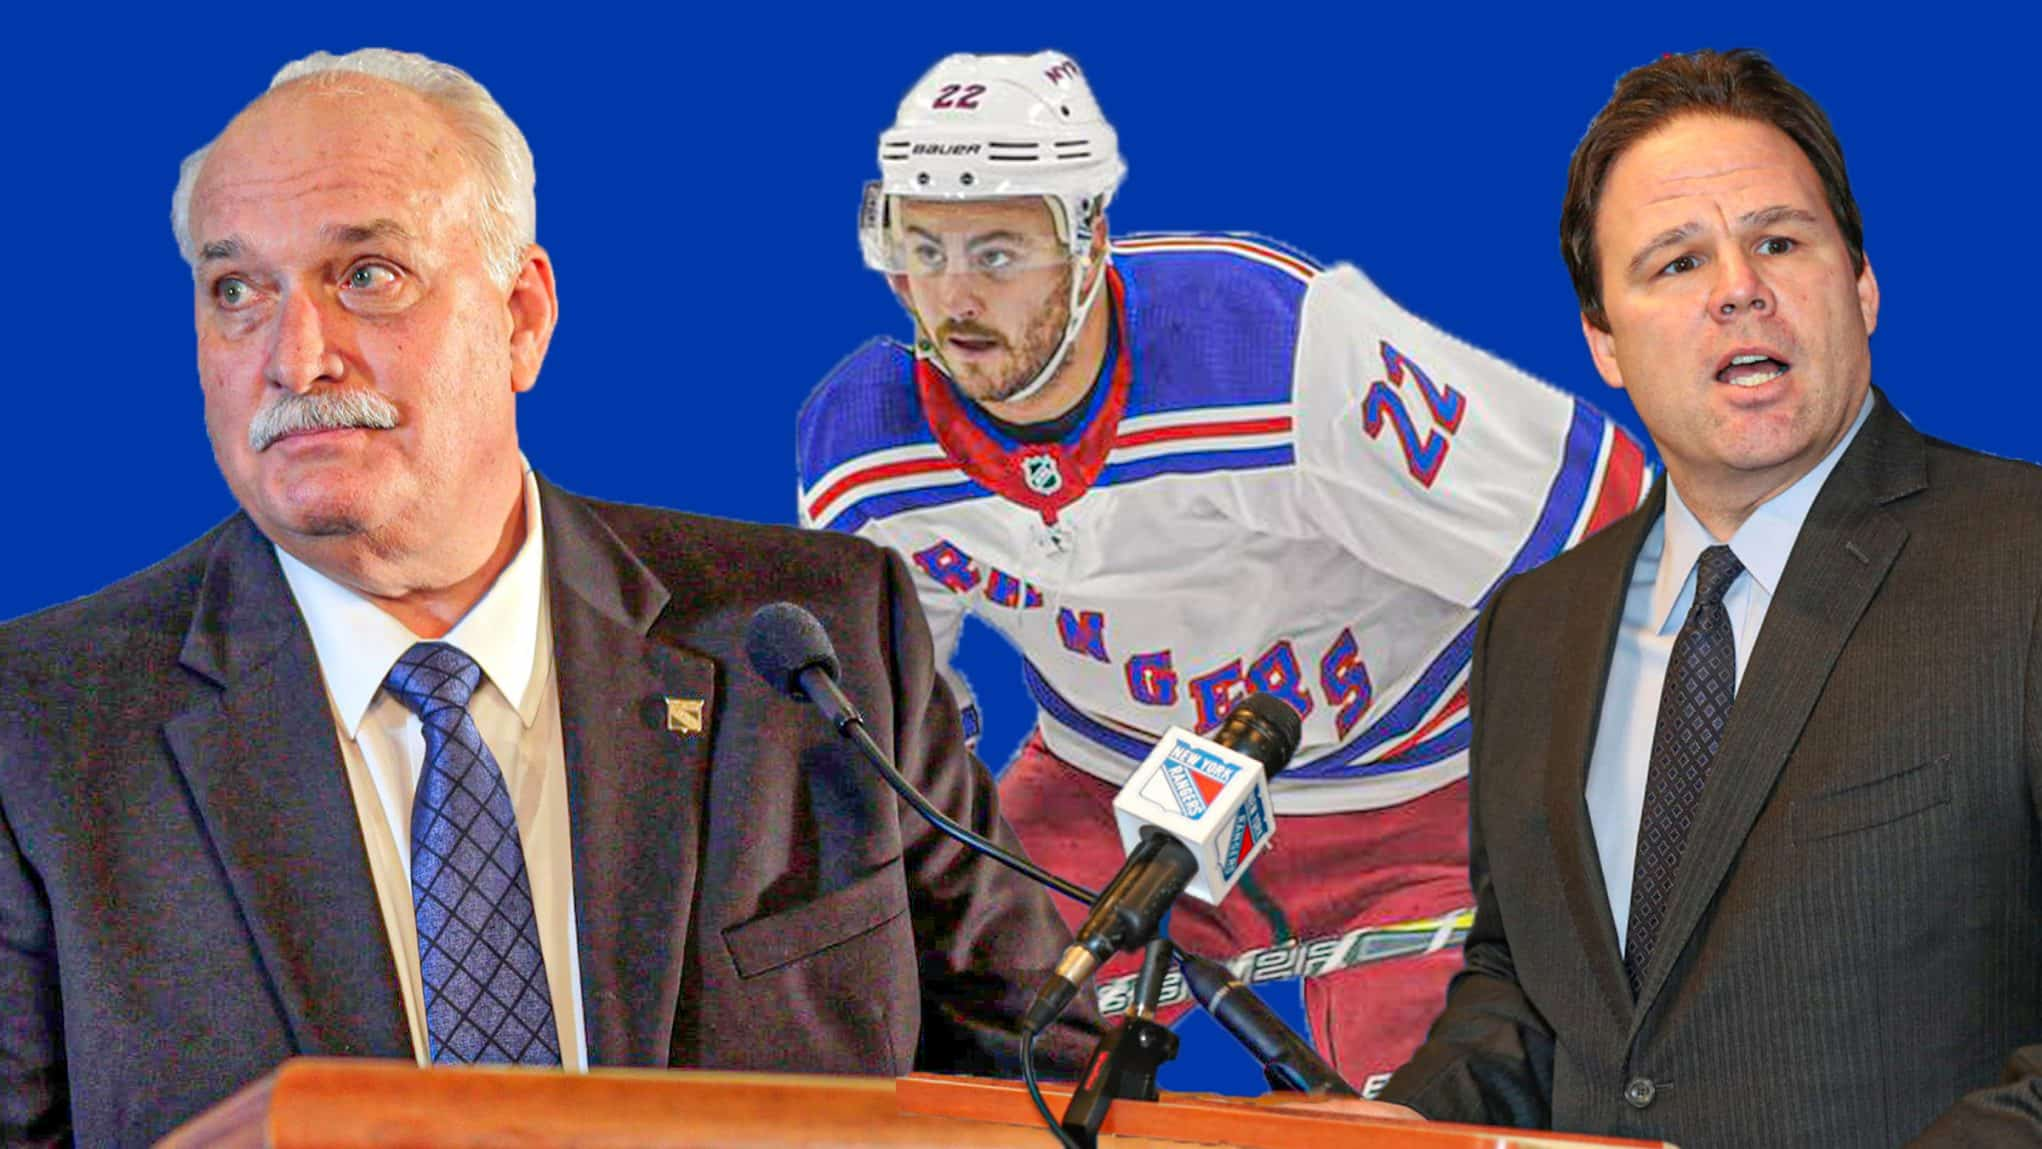 John Davidson, Kevin Shattenkirk, Jeff Gorton